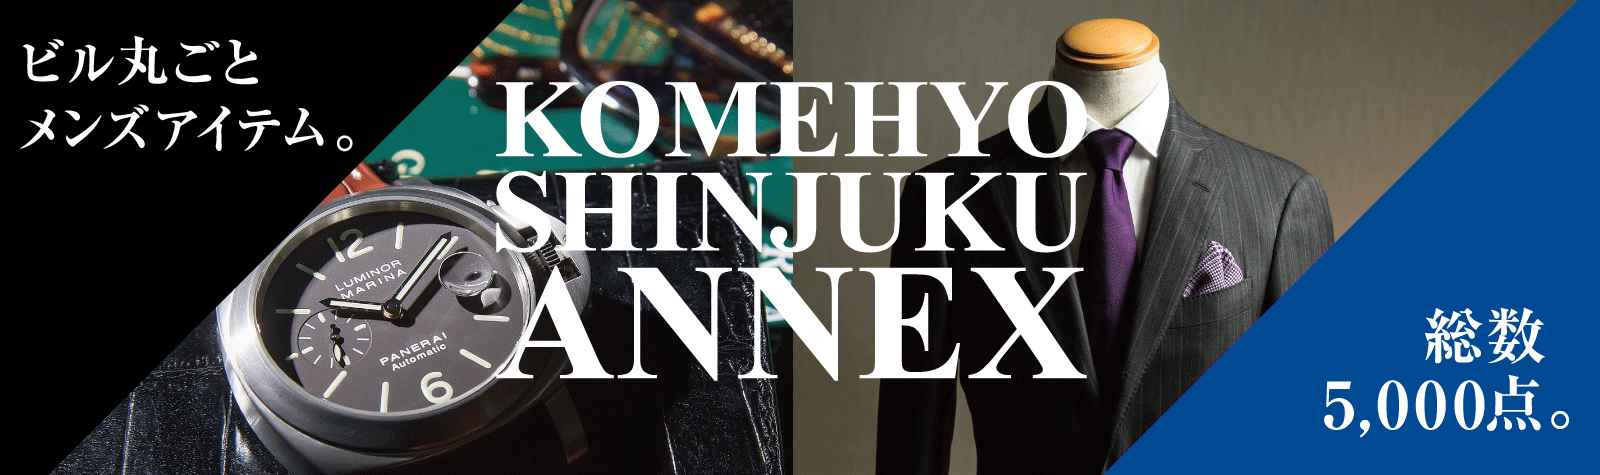 新宿店 ANNEX